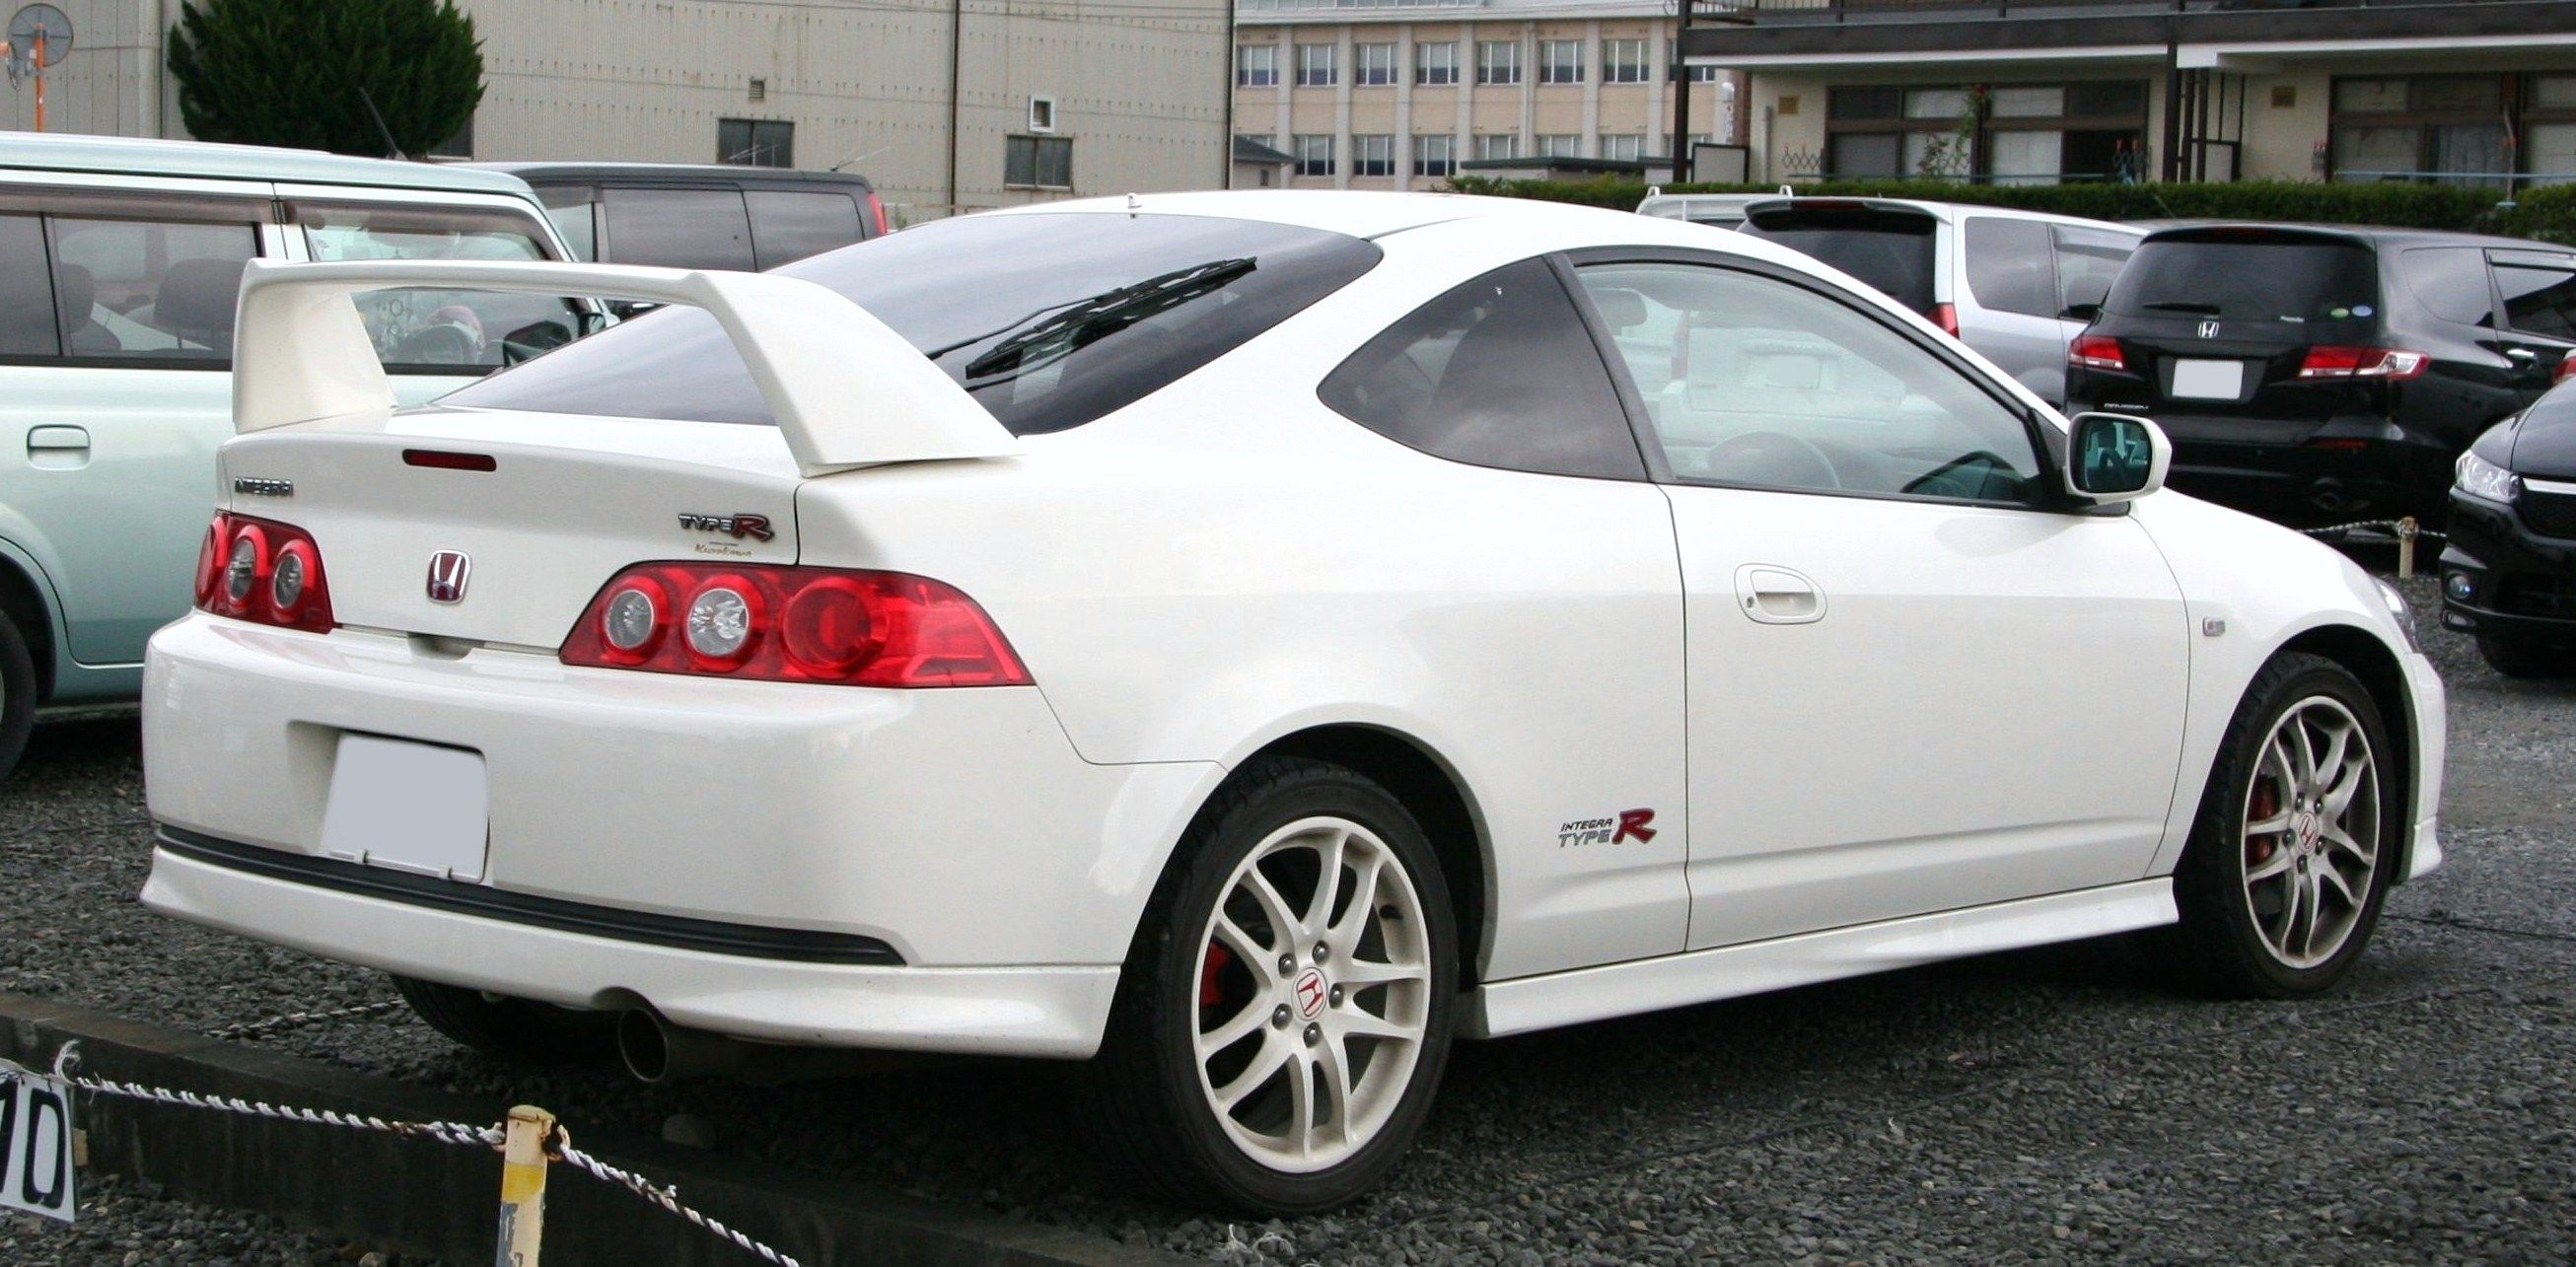 Genial Honda Integra Type R (DC5)